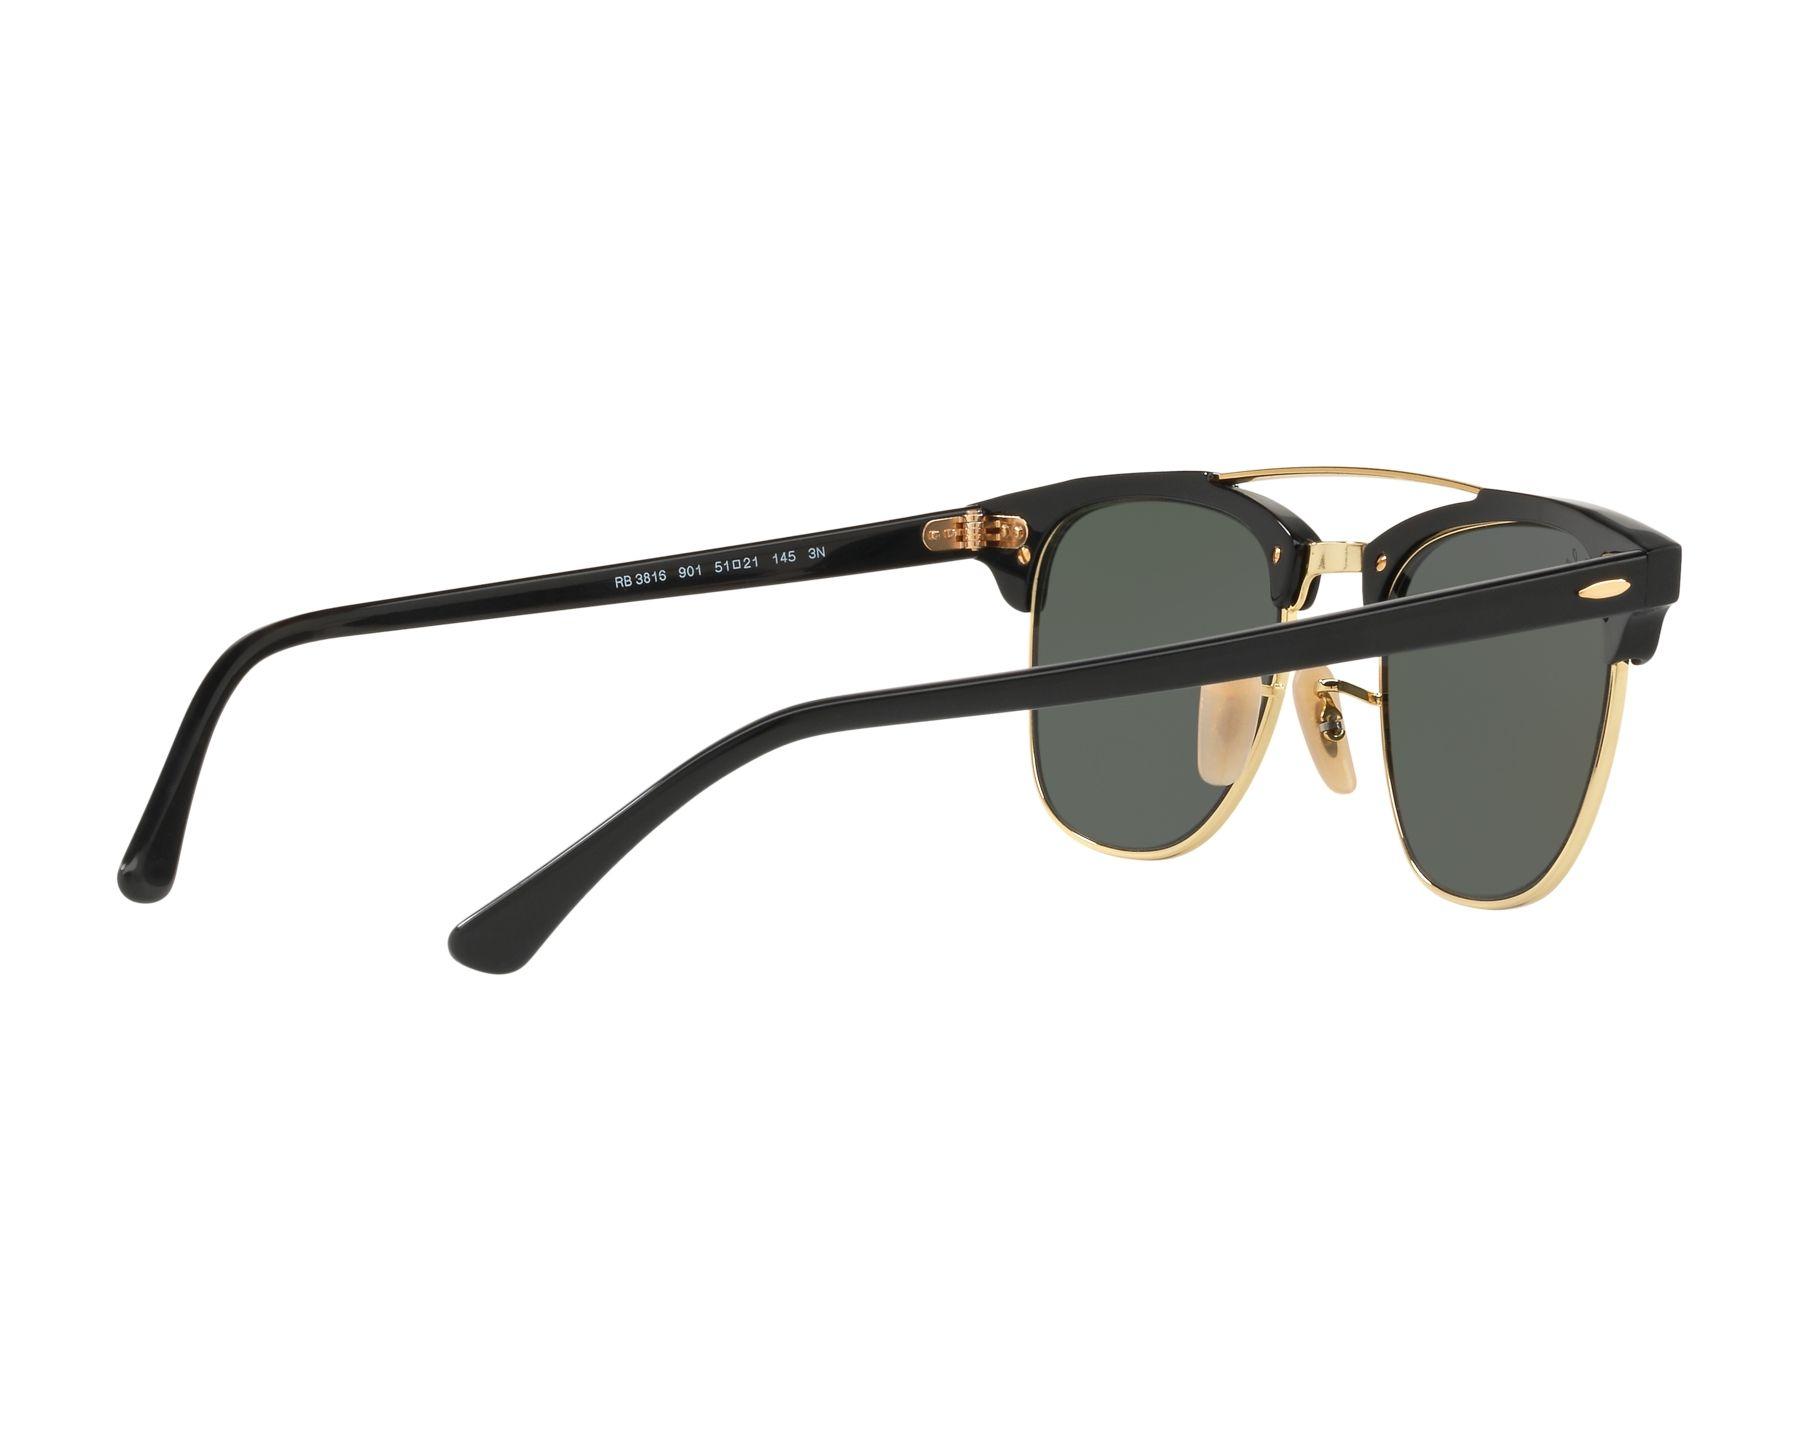 743b5b8cf18 Sunglasses Ray-Ban RB-3816 901 51-21 Black Gold 360 degree view